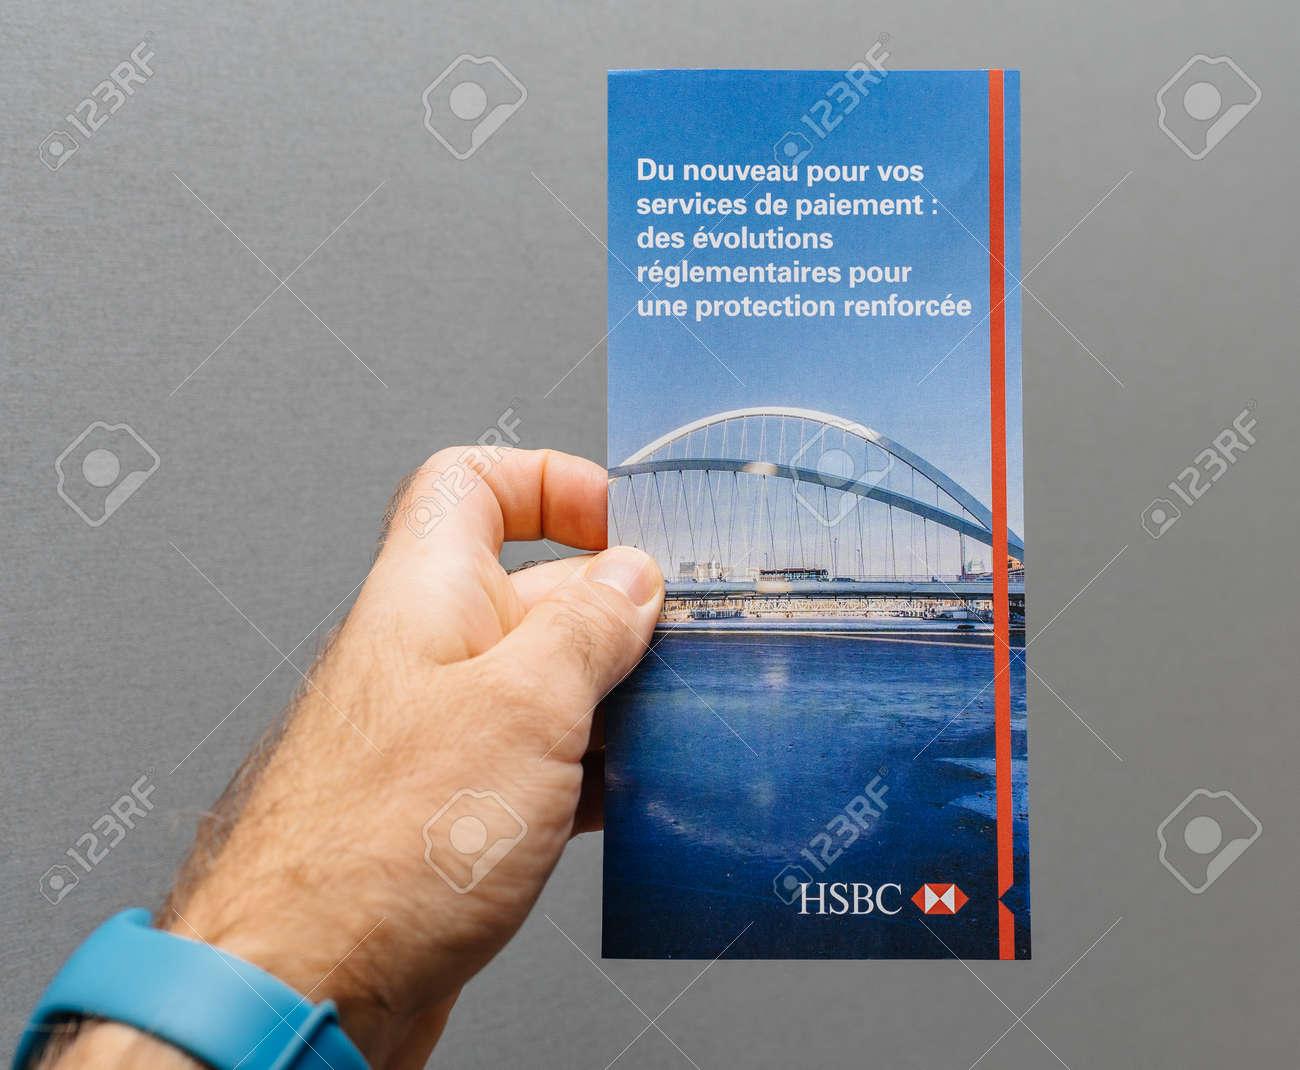 PARIS, FRANCE - NOV 28, 2017: Man hand holding HSBC bank flyer